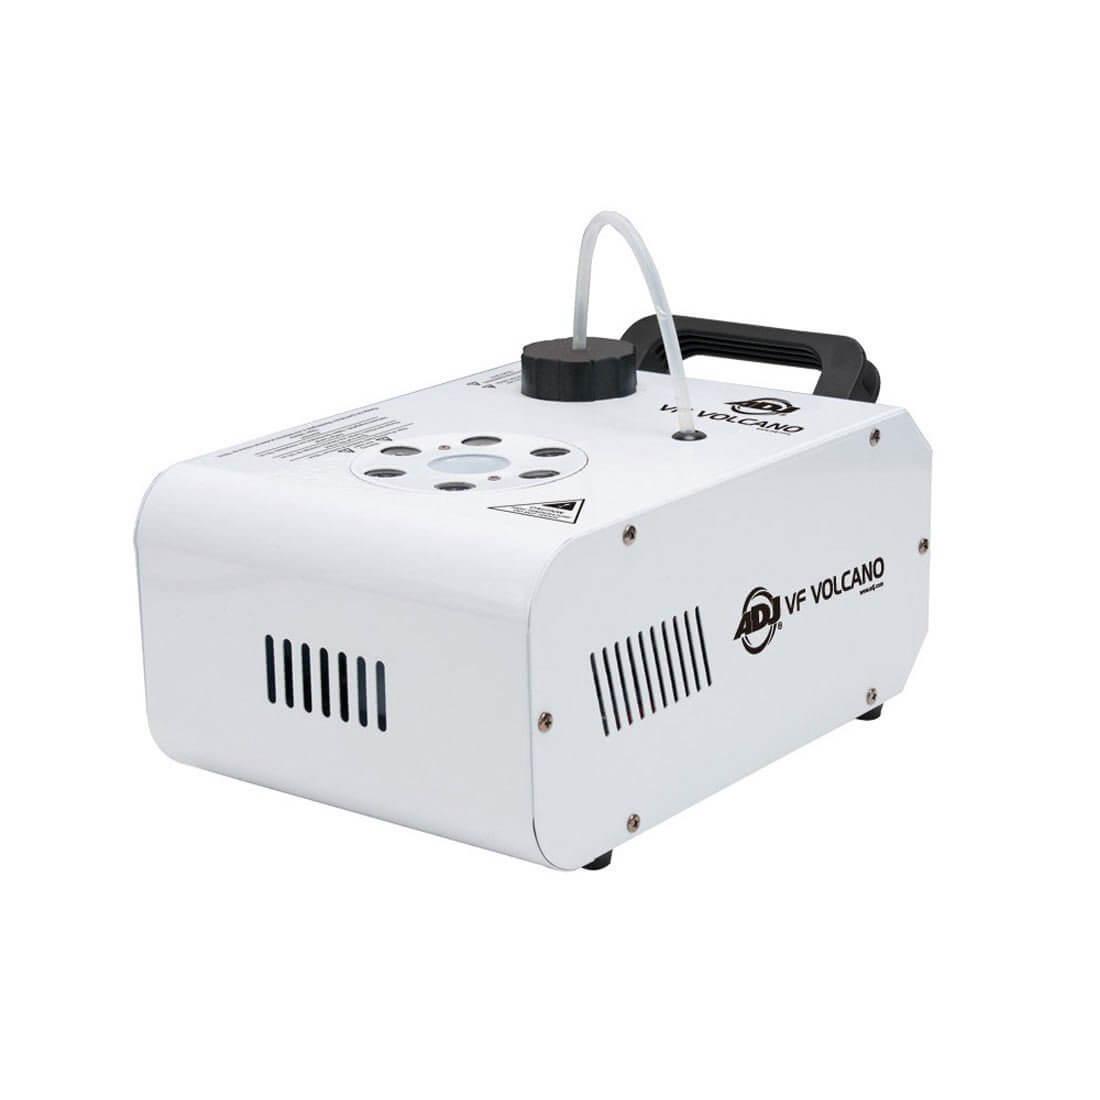 ADJ VF Volcano 750W Vertical Smoke Machine inc Wireless Remote